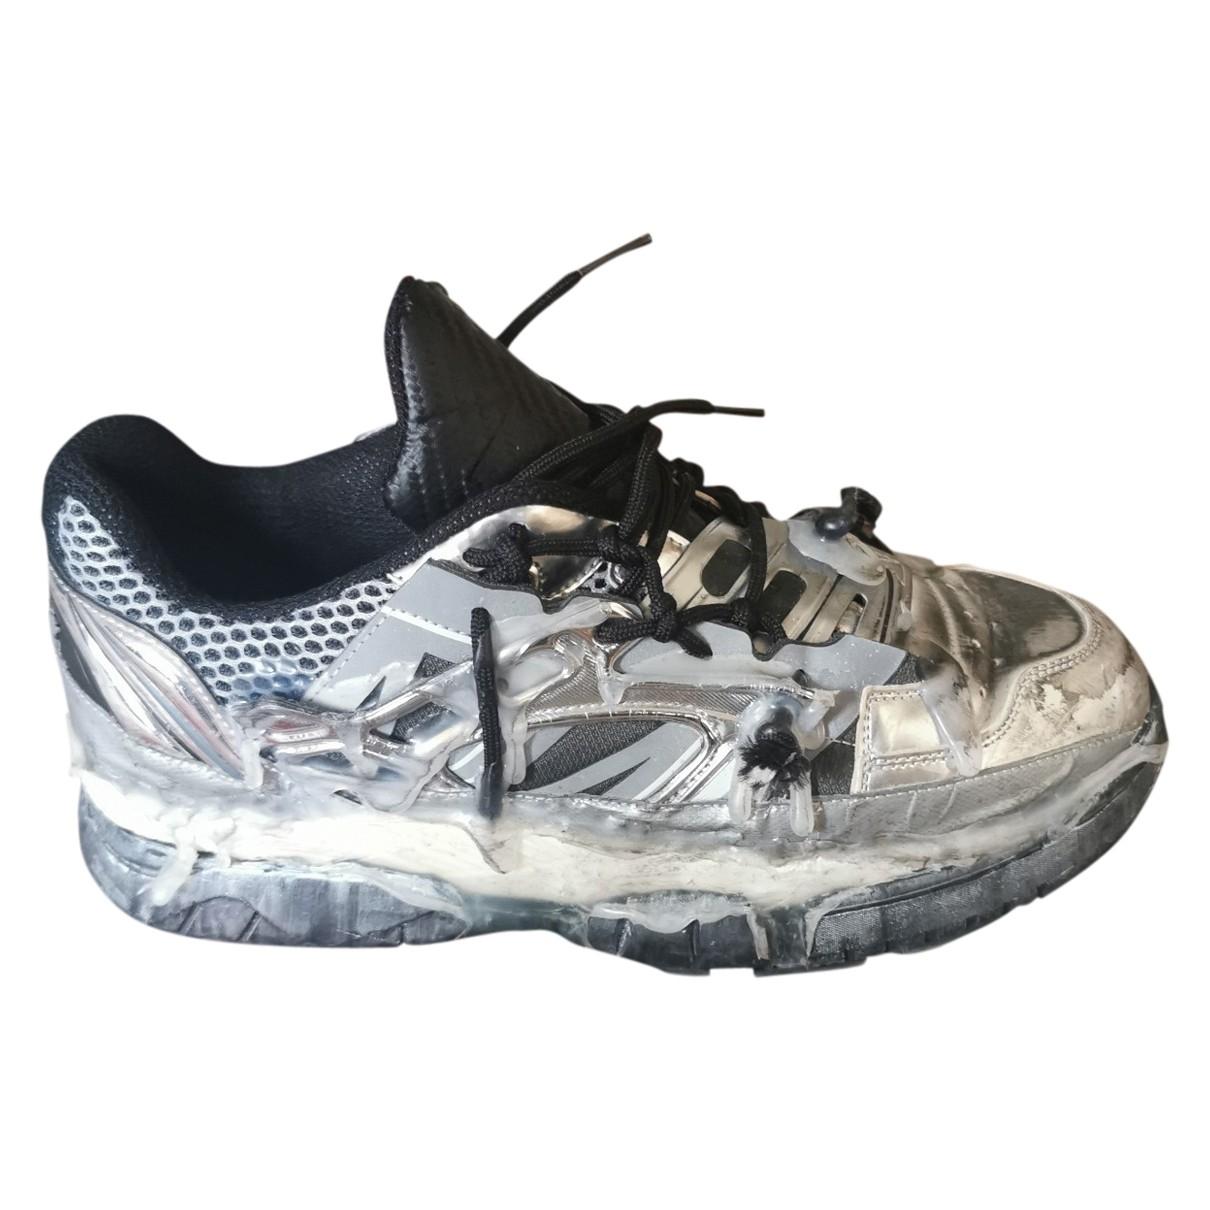 Maison Martin Margiela Fusion  Sneakers in  Silber Leder